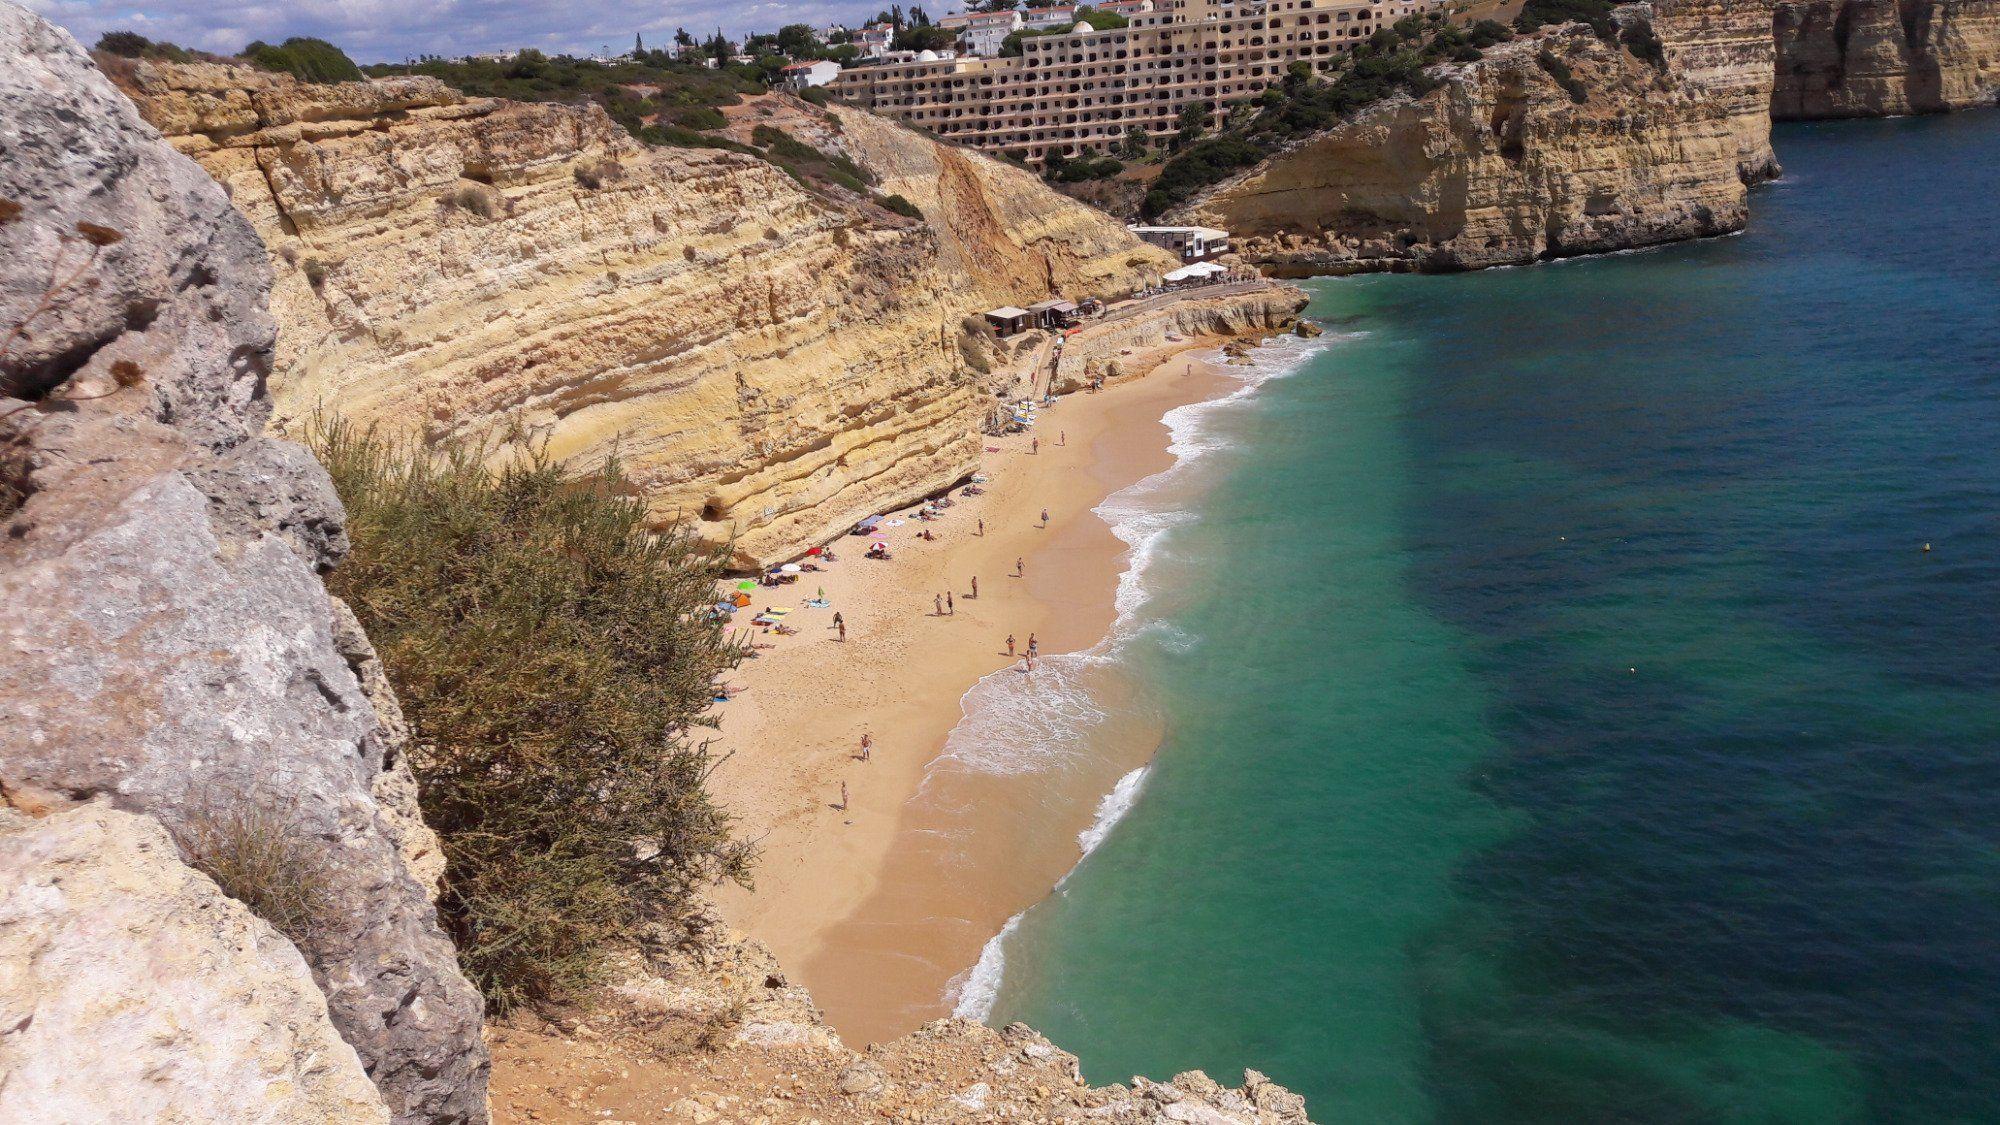 Vale de Centeanes Beach, Carvoeiro: See 104 reviews, articles, and 112 photos of Vale de Centeanes Beach, ranked No.6 on TripAdvisor among 23 attractions in Carvoeiro.